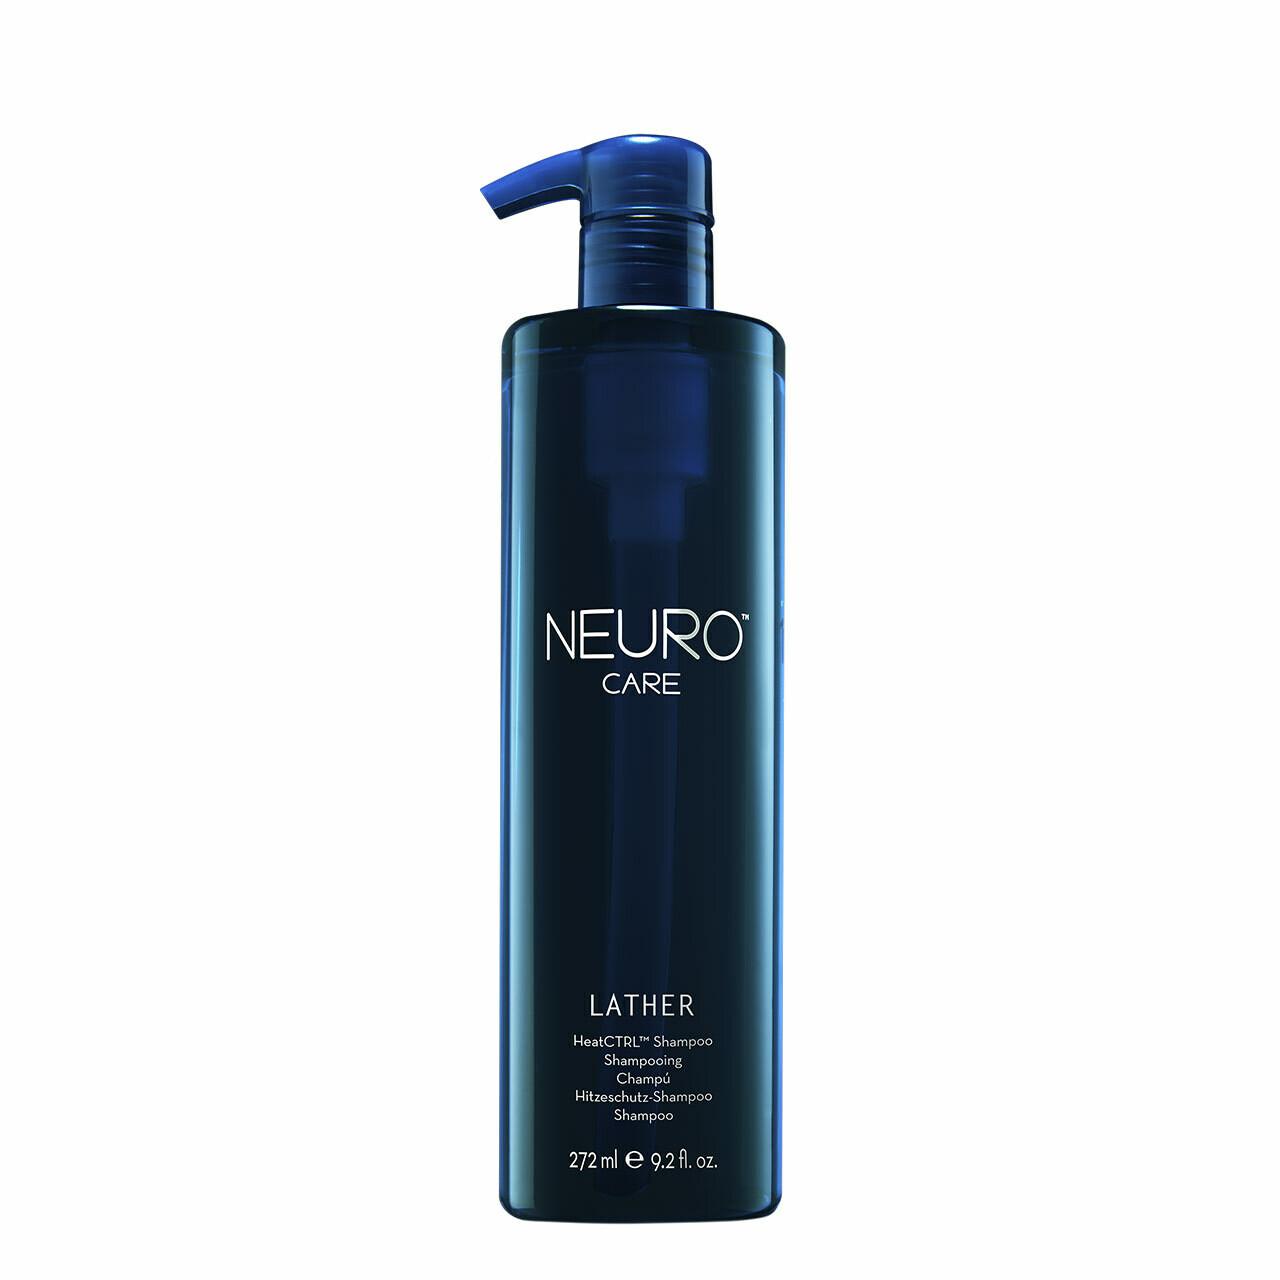 Neuro Lather Shampoo 272ml